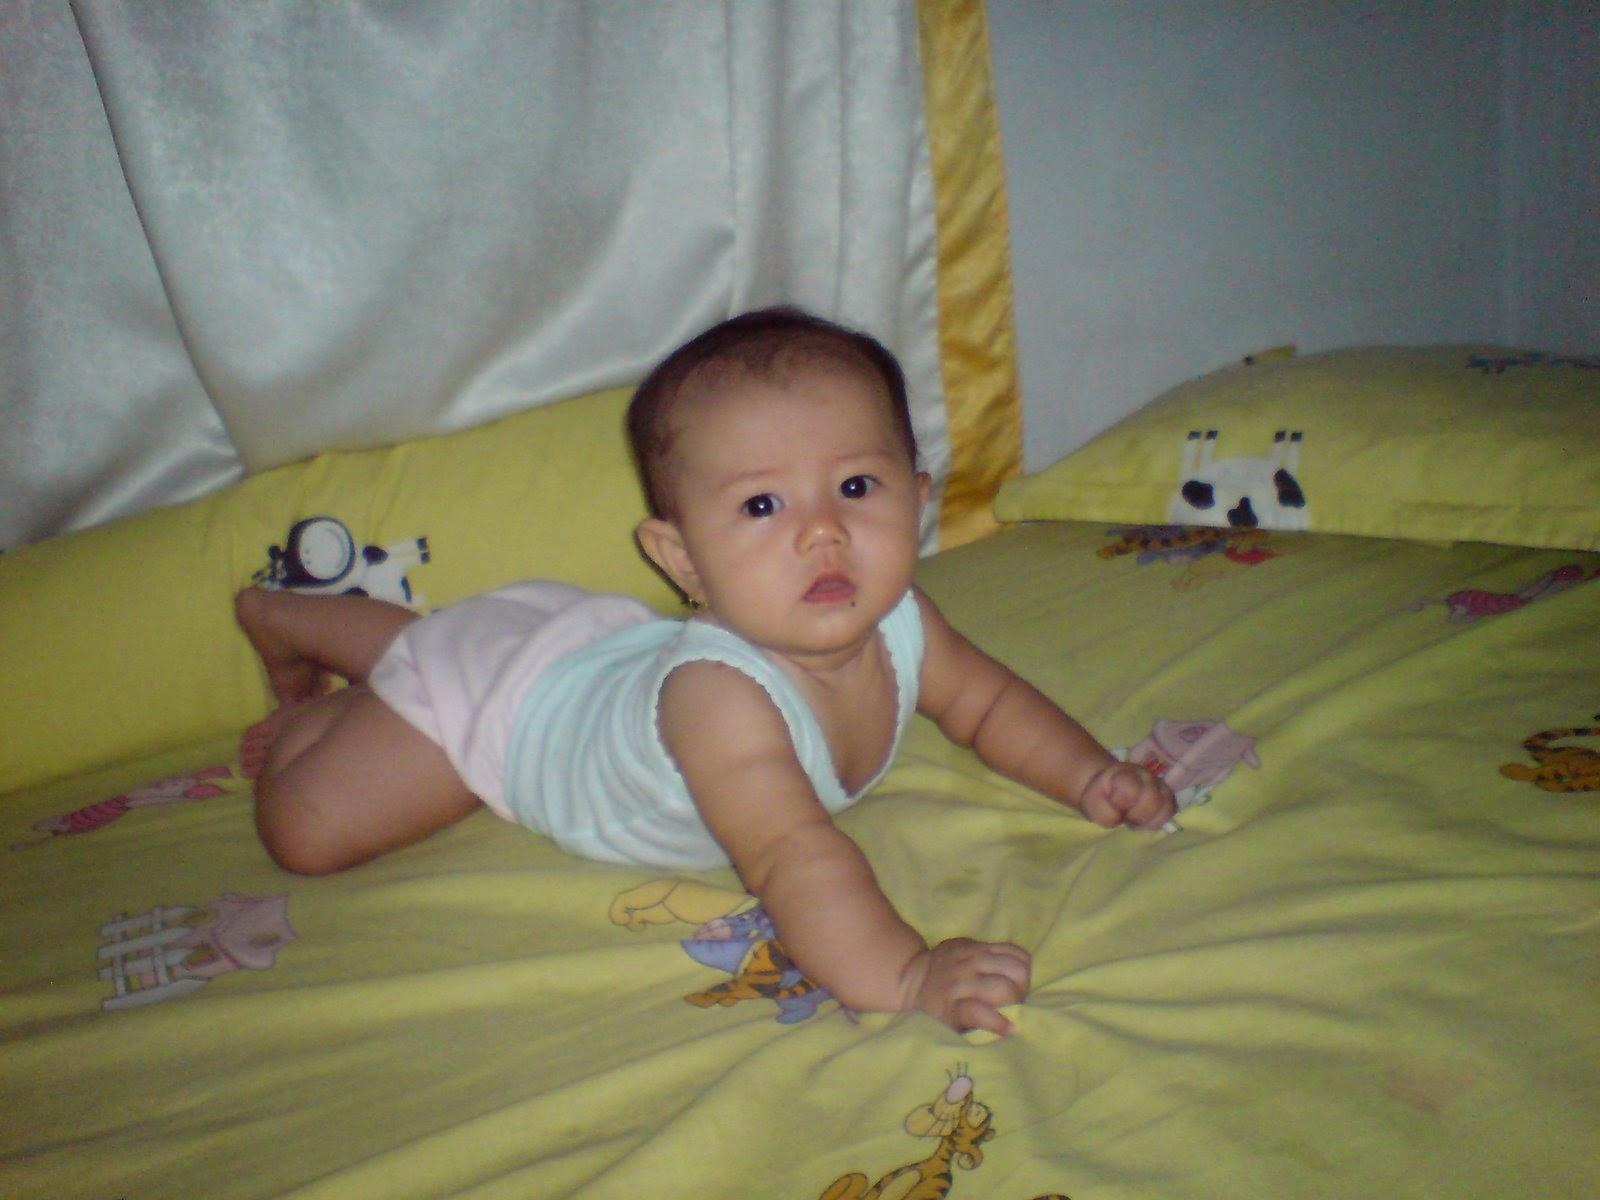 gambar bayi lucu belajar tengkurap